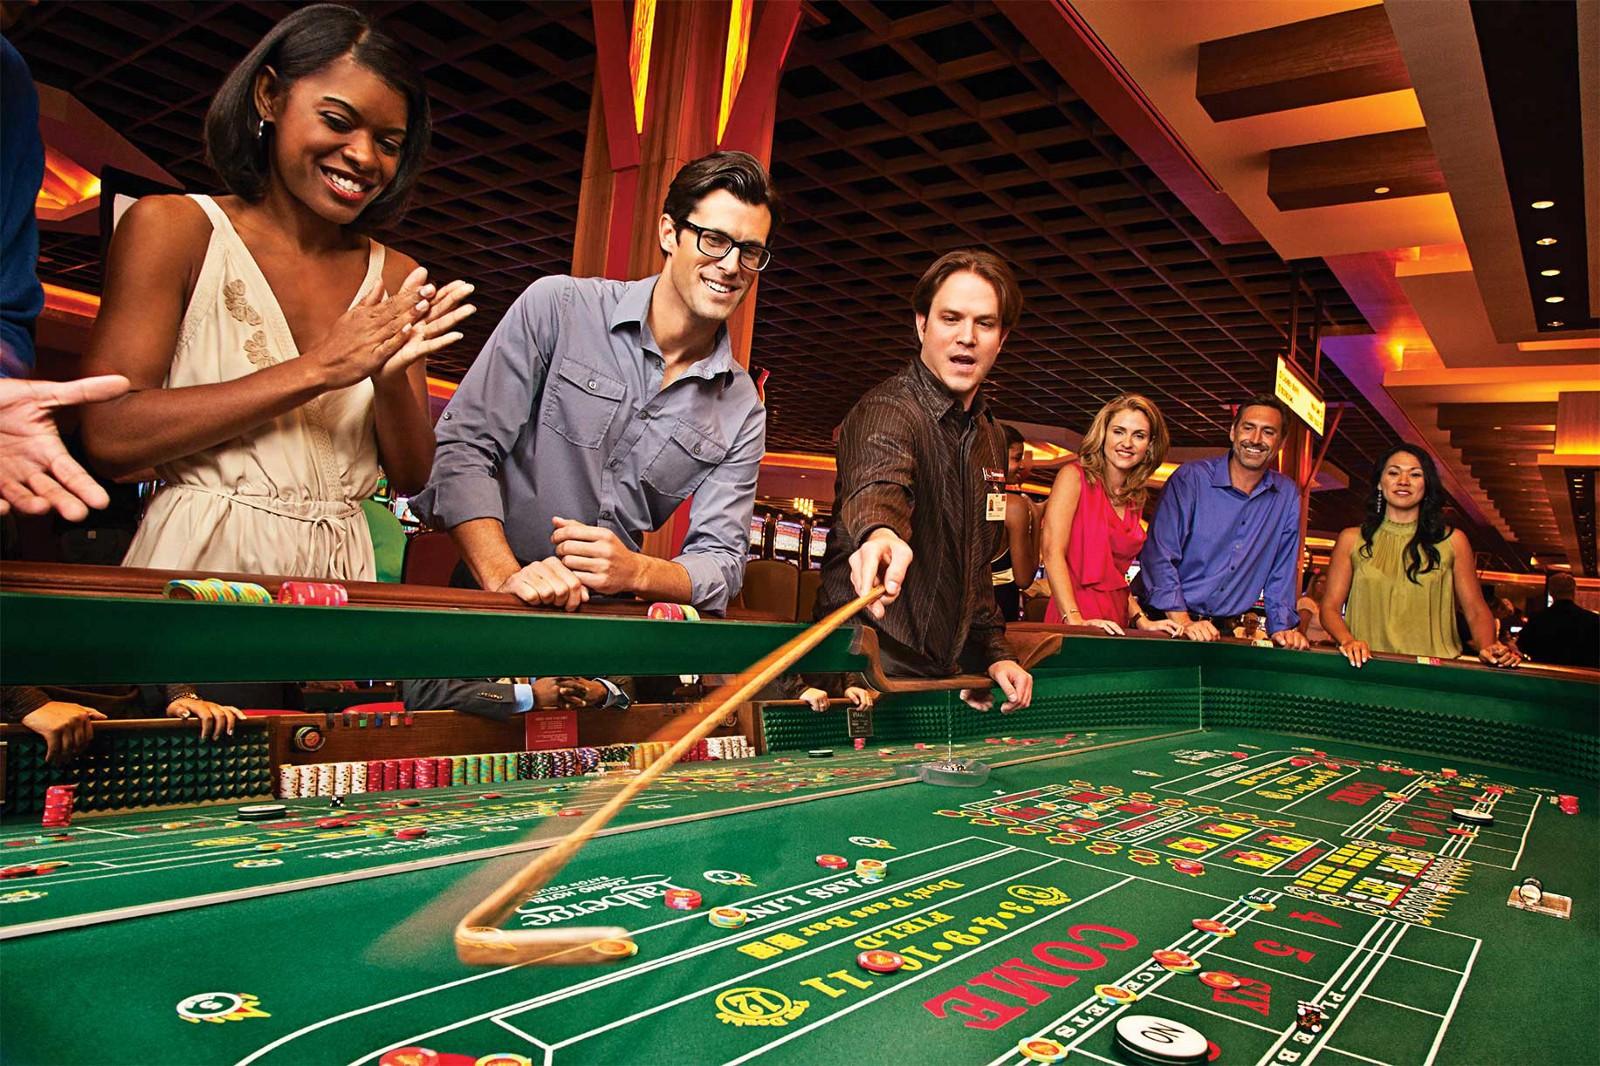 Sa. The Casino Games Heaven